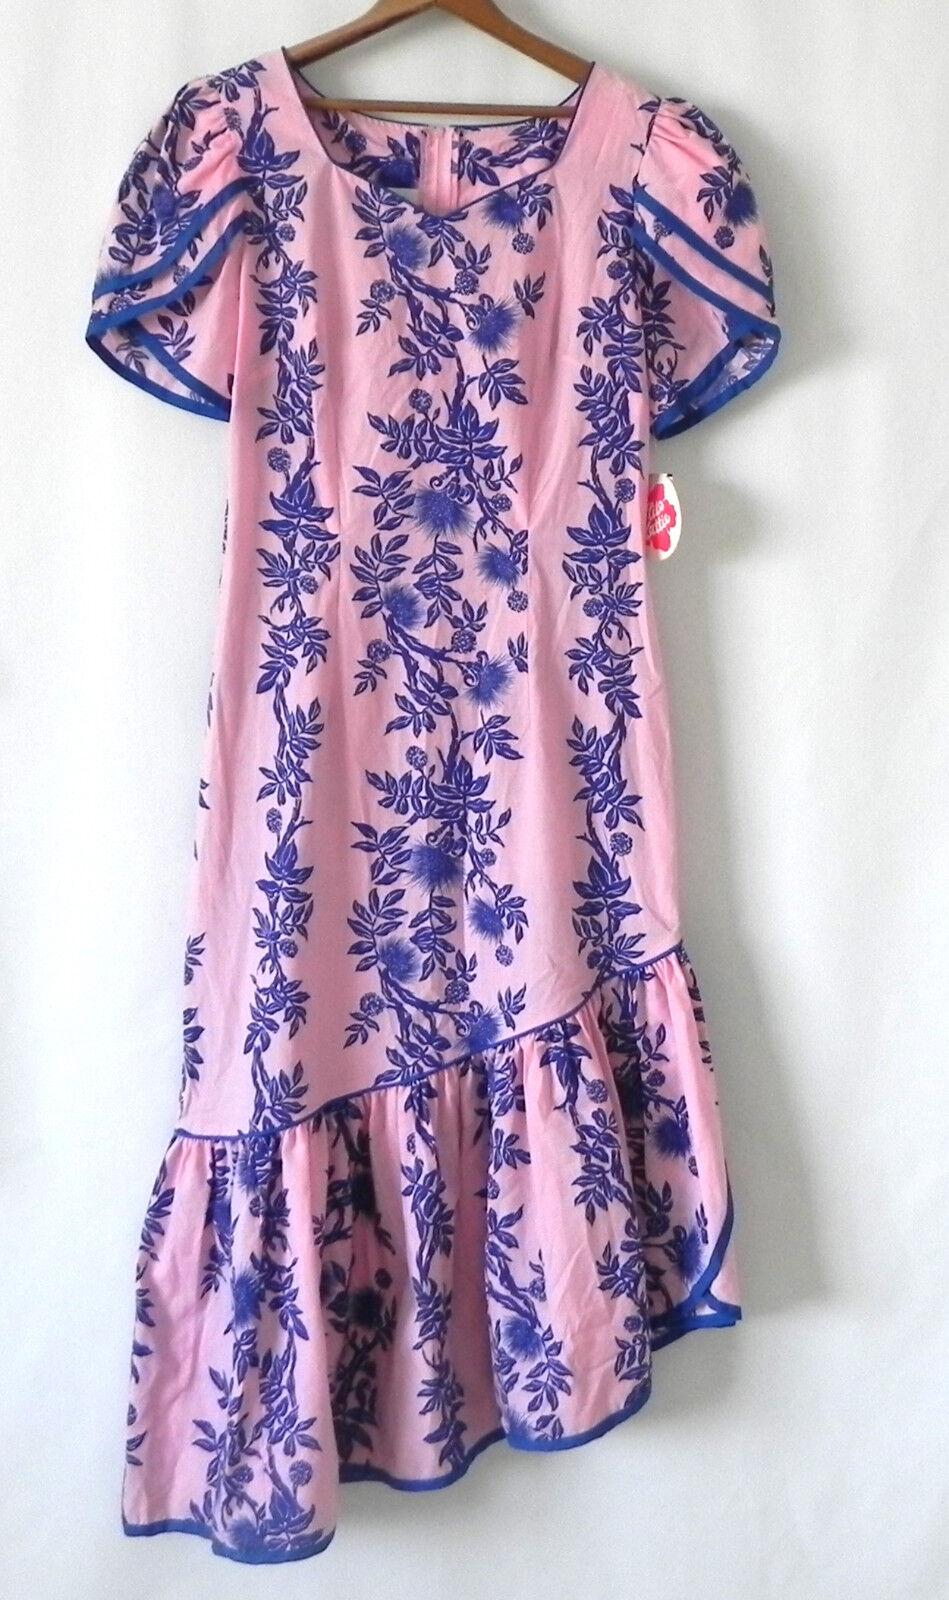 Hilo Hattie Dress Floral Asymmetrical Riffle Hem Short Sleeve Cotton Poly Size12